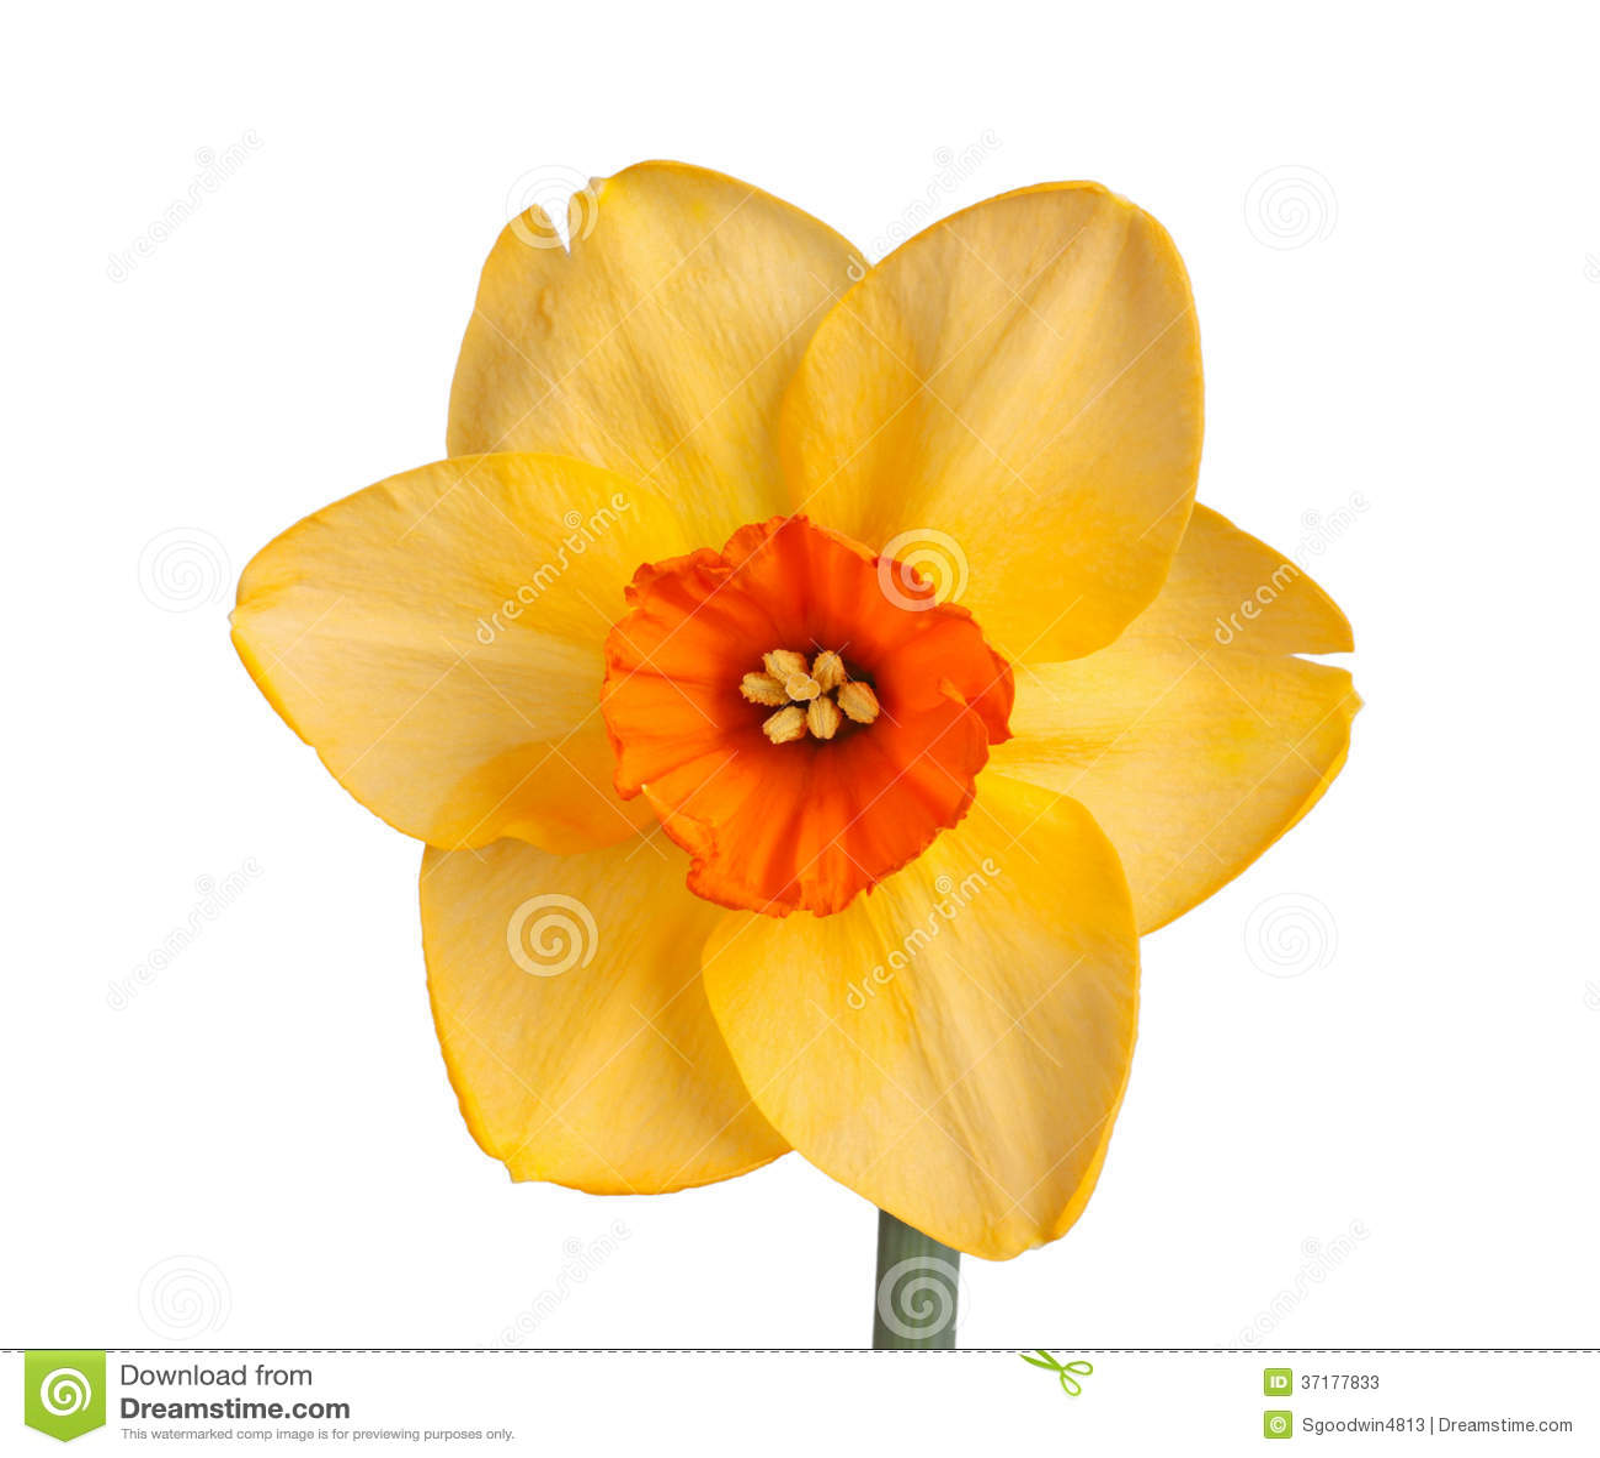 Single Flower Of A Daffodil Cultivar Against A White Background